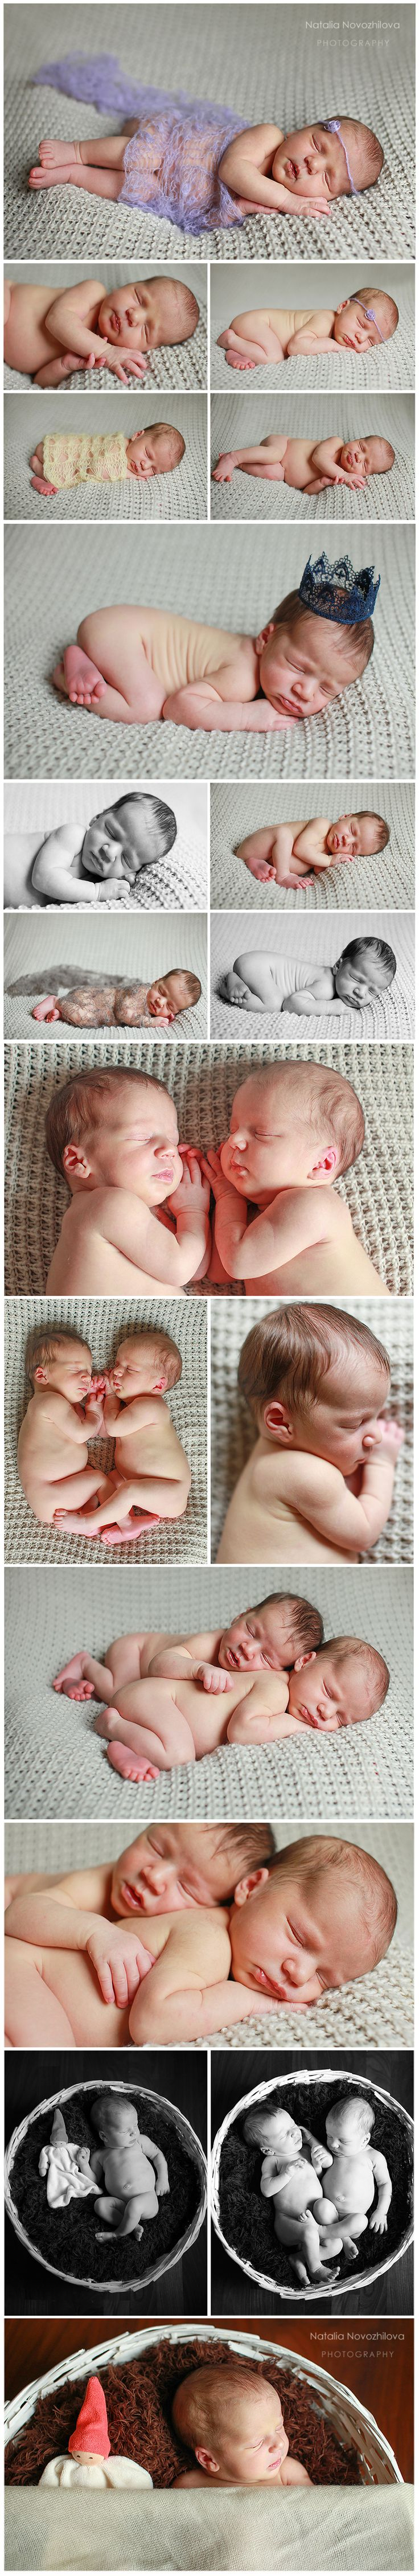 Natalia Novozhilova Photography Gemelli di 16 giorni  twin newborn photography #twins #twin #newborntwin #twinsphotography